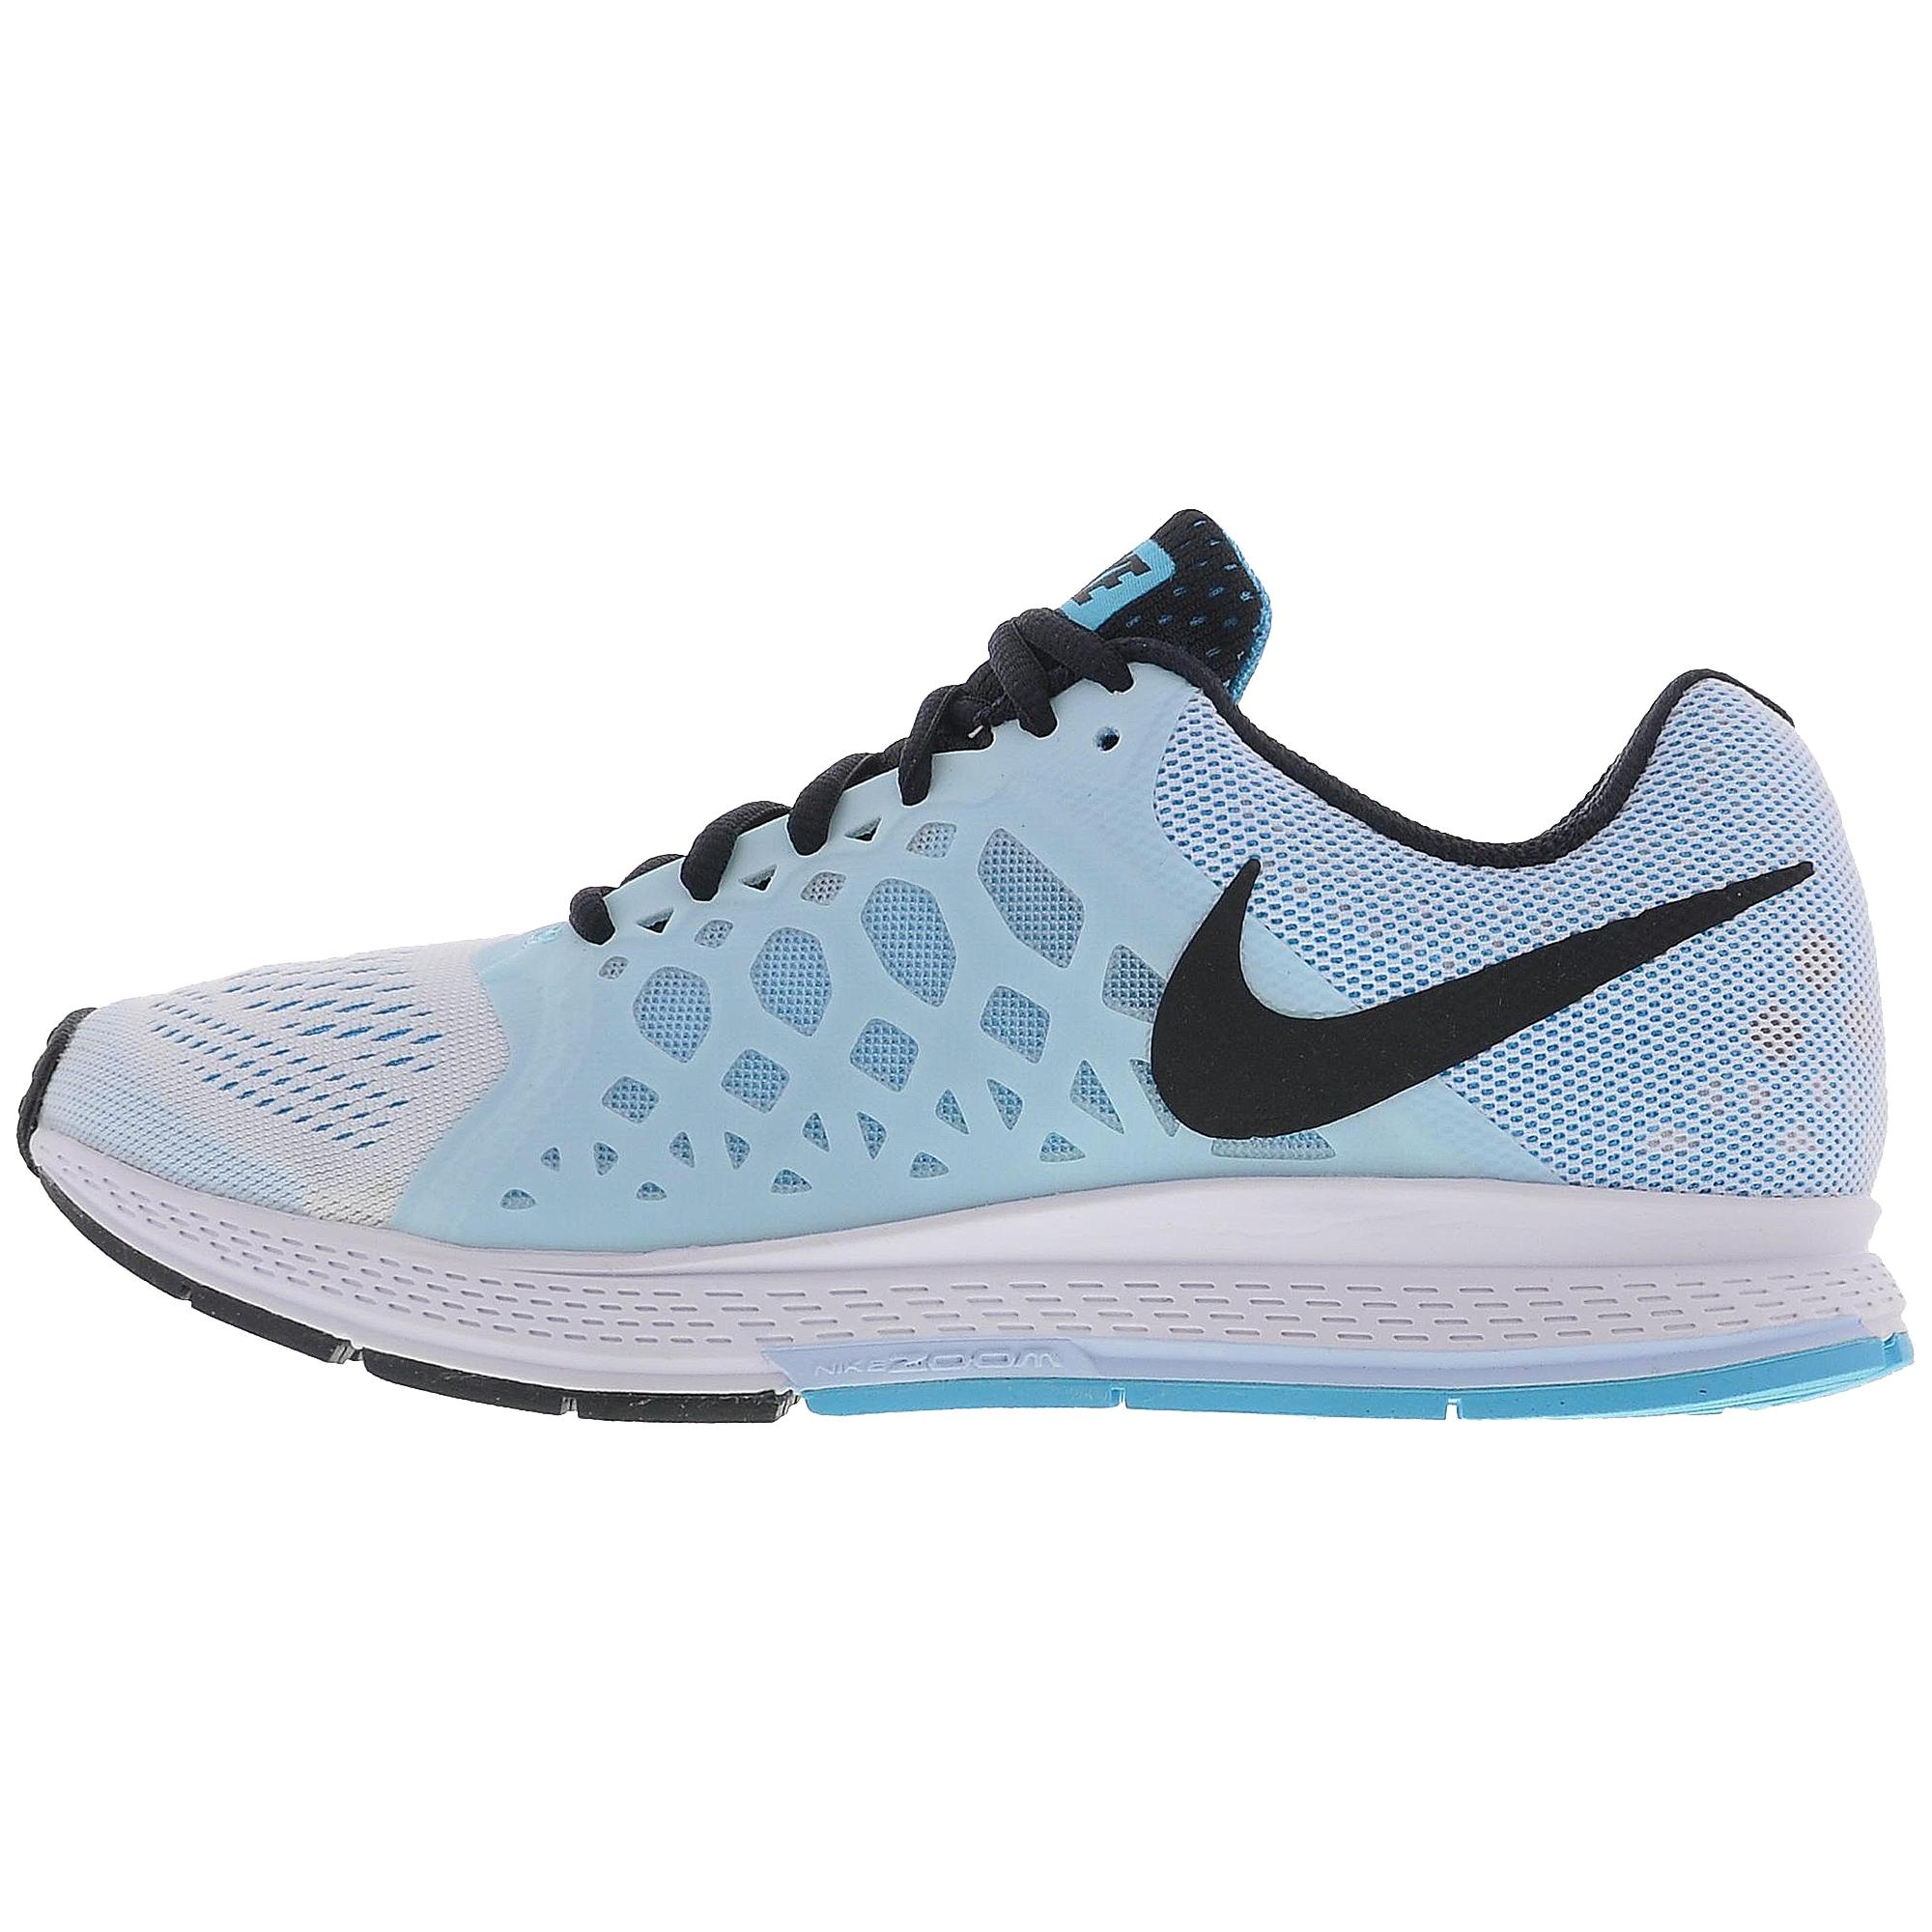 get cheap c117a f0632 Nike Air Zoom Pegasus 31 Kadın Spor Ayakkabı